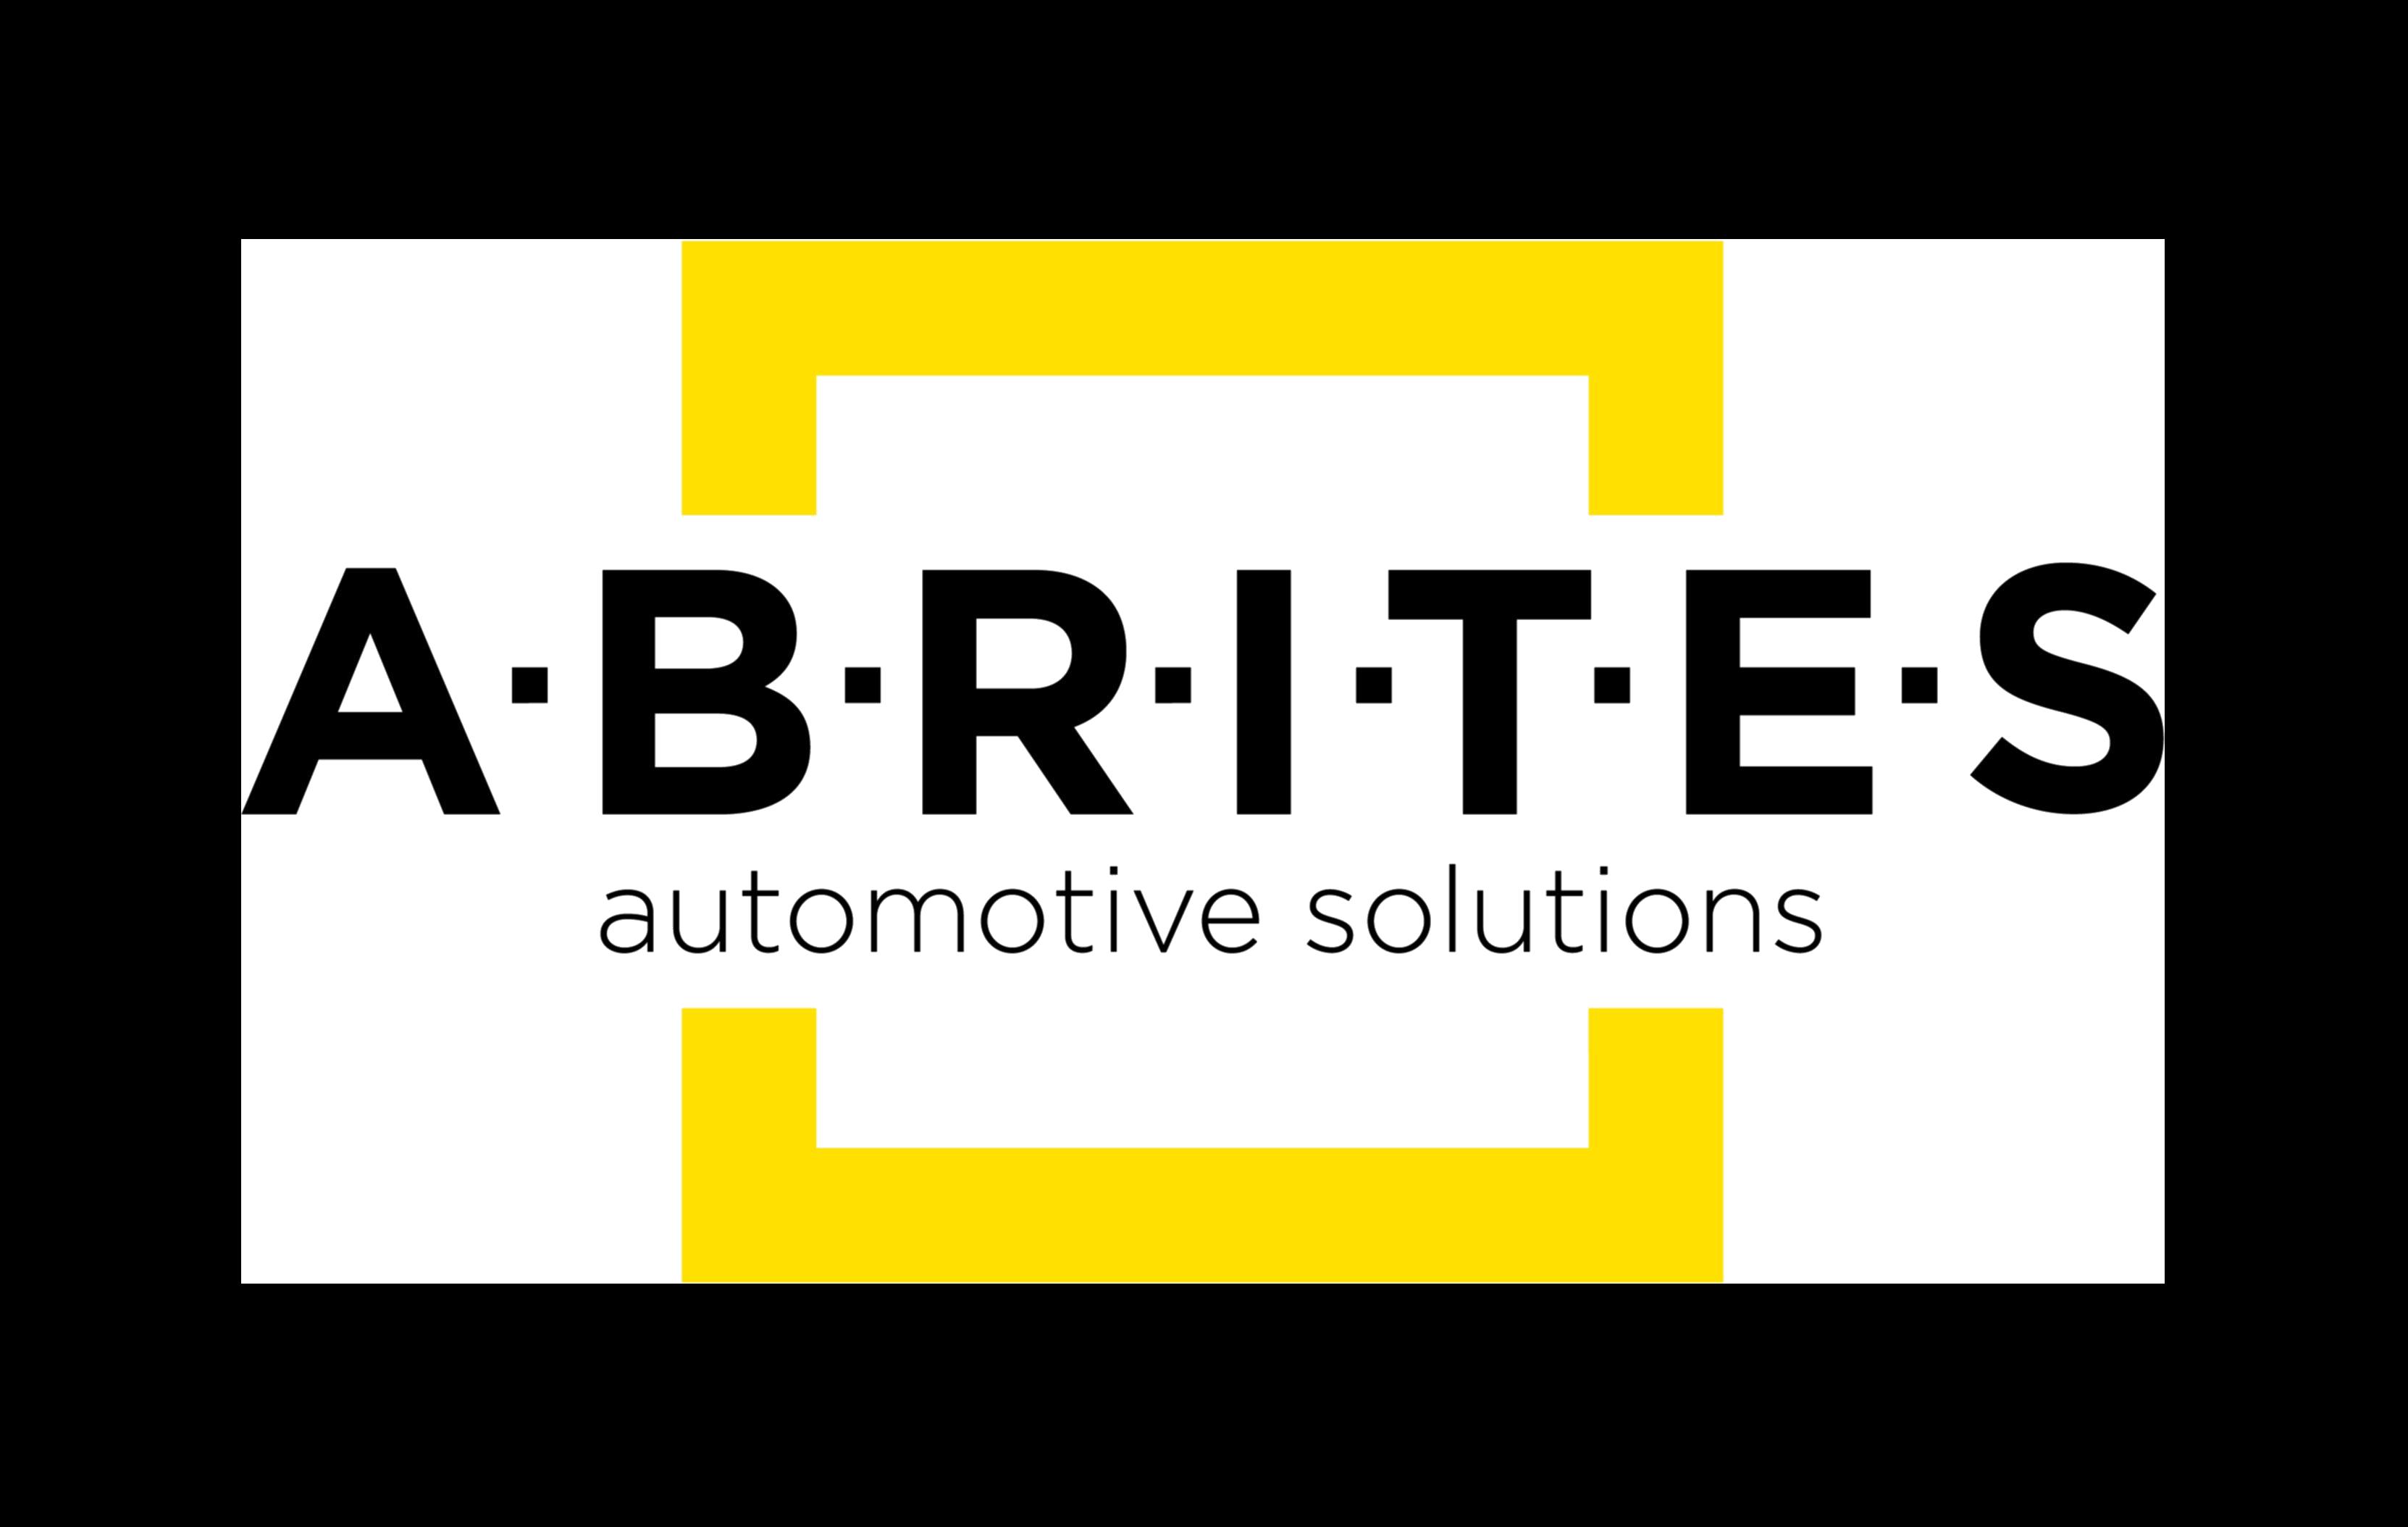 ABRITES